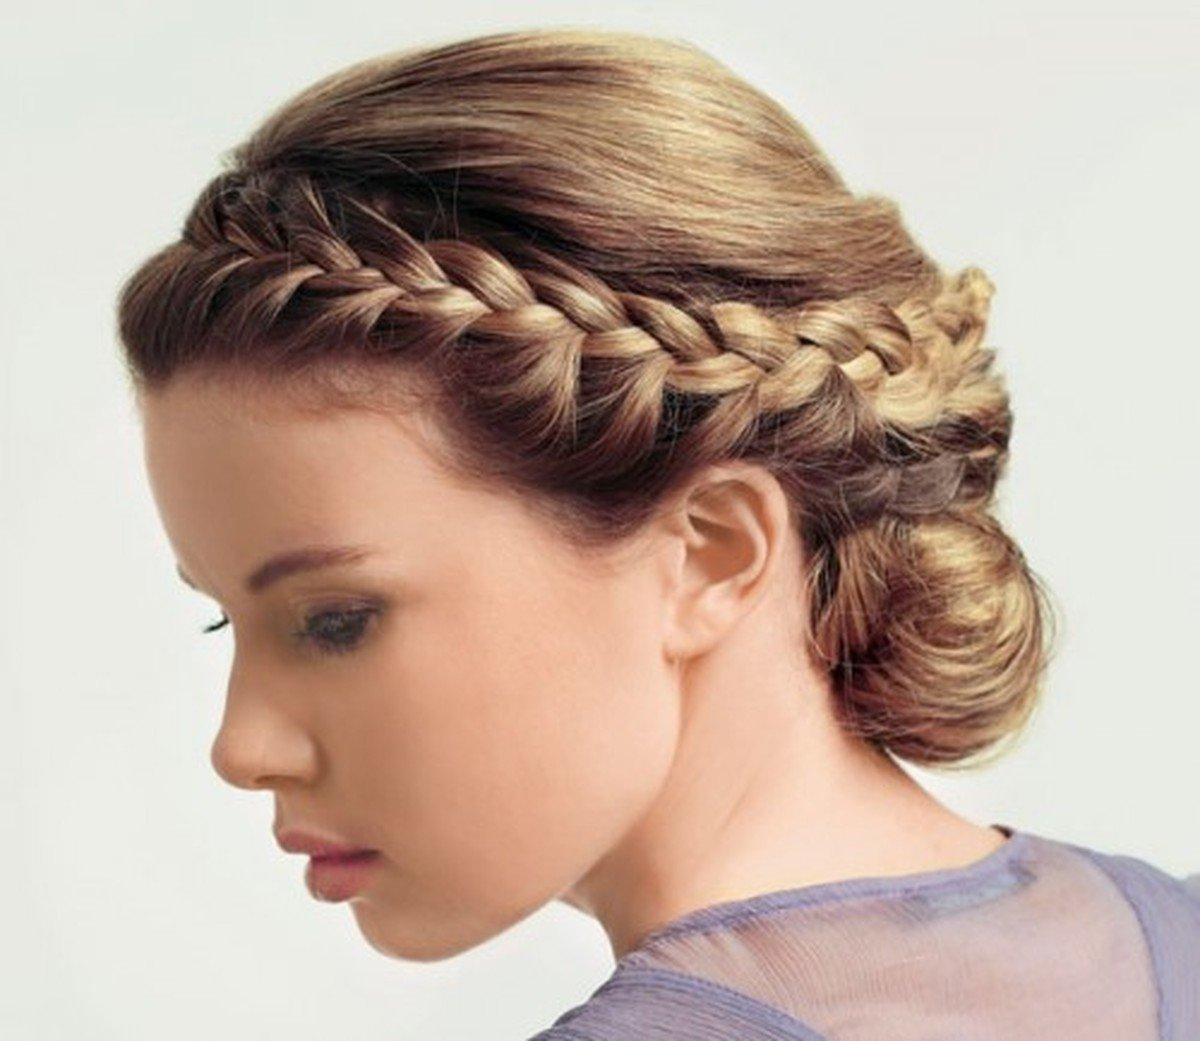 Фото причёсок с косичками на средние волосы